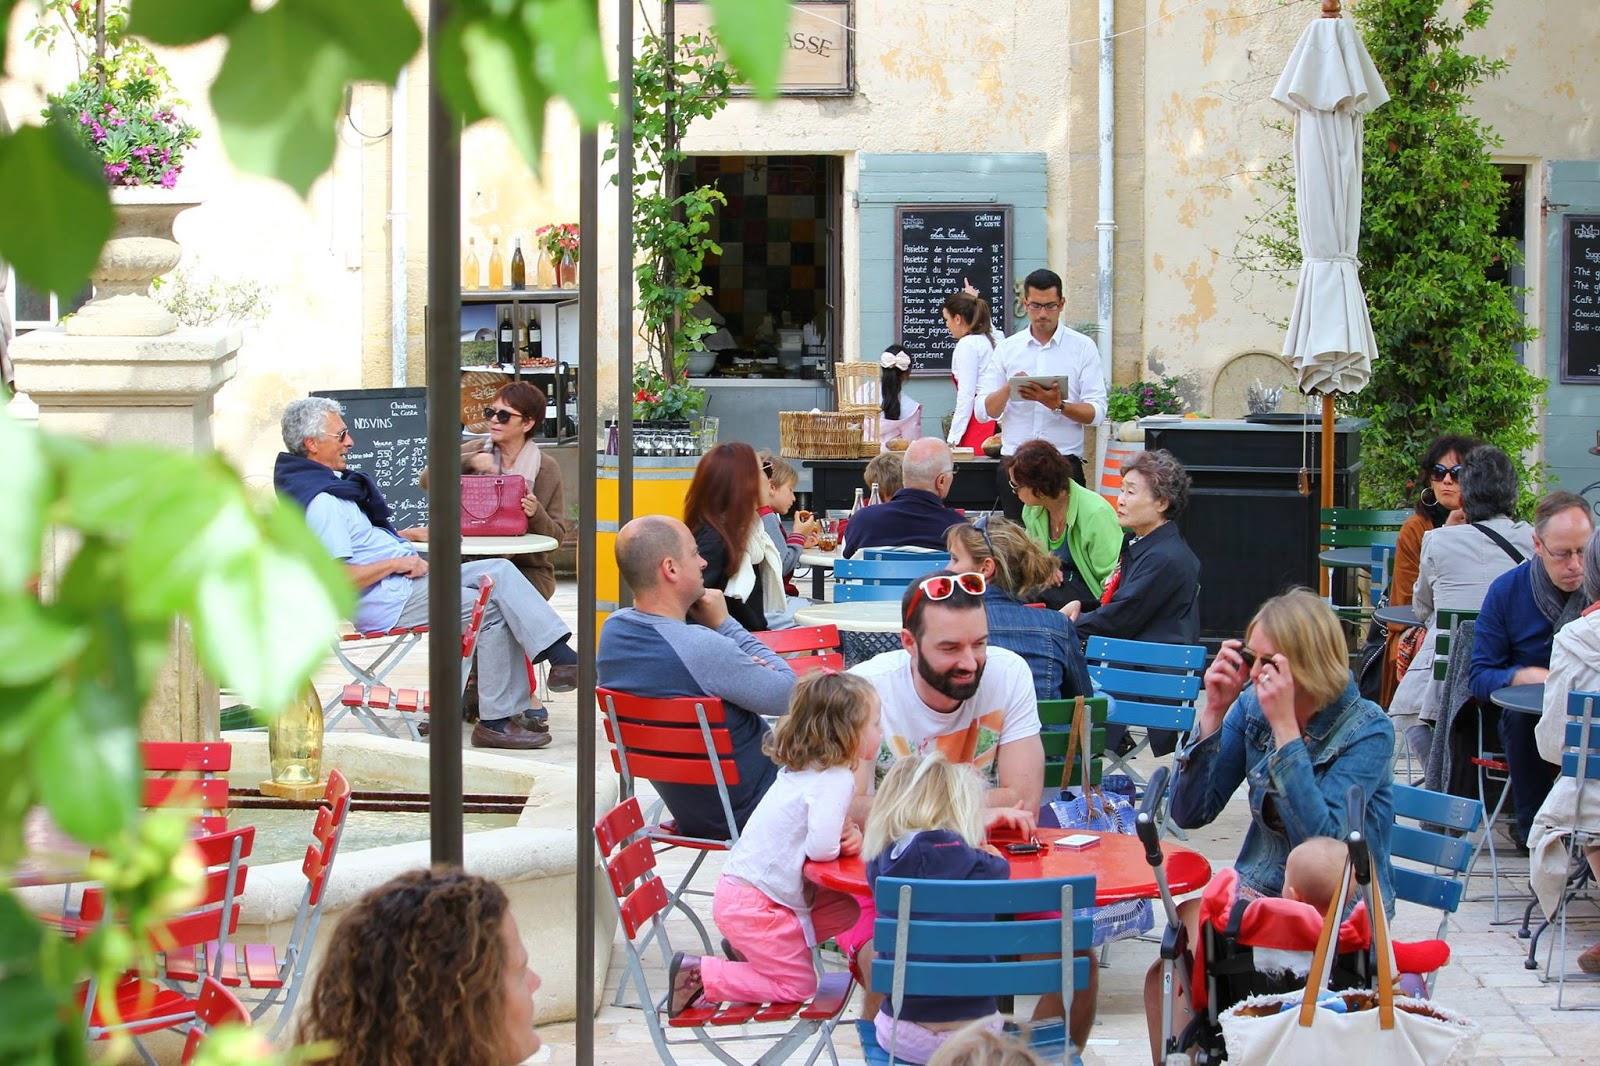 Le Cafe Creme Le Puy Sainte Reparade